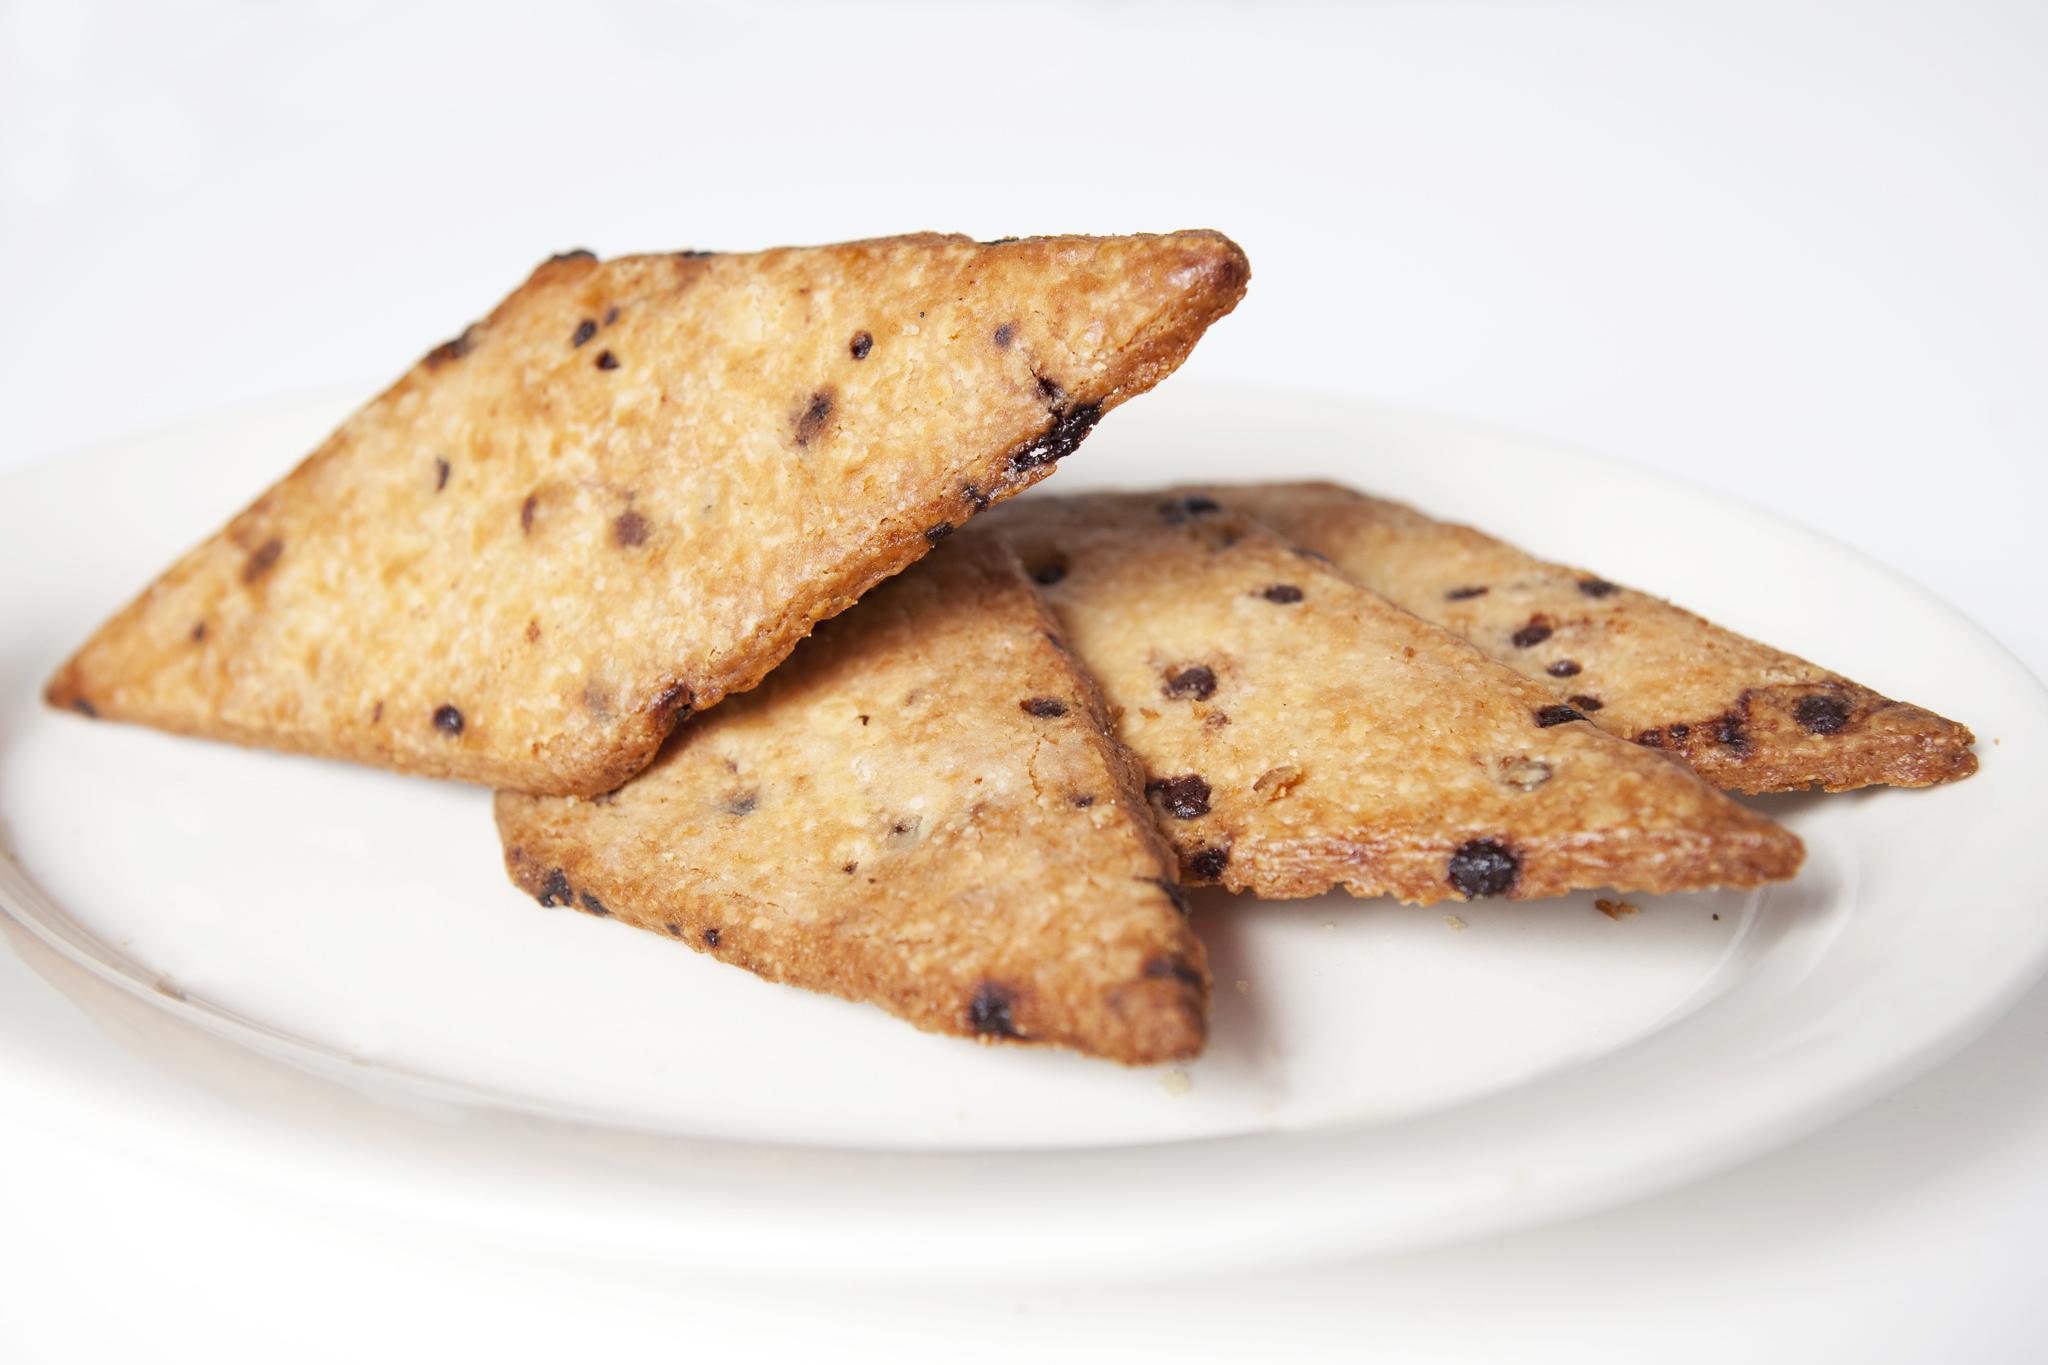 Diamond chocolate-chip shortbread from Bien Cuit